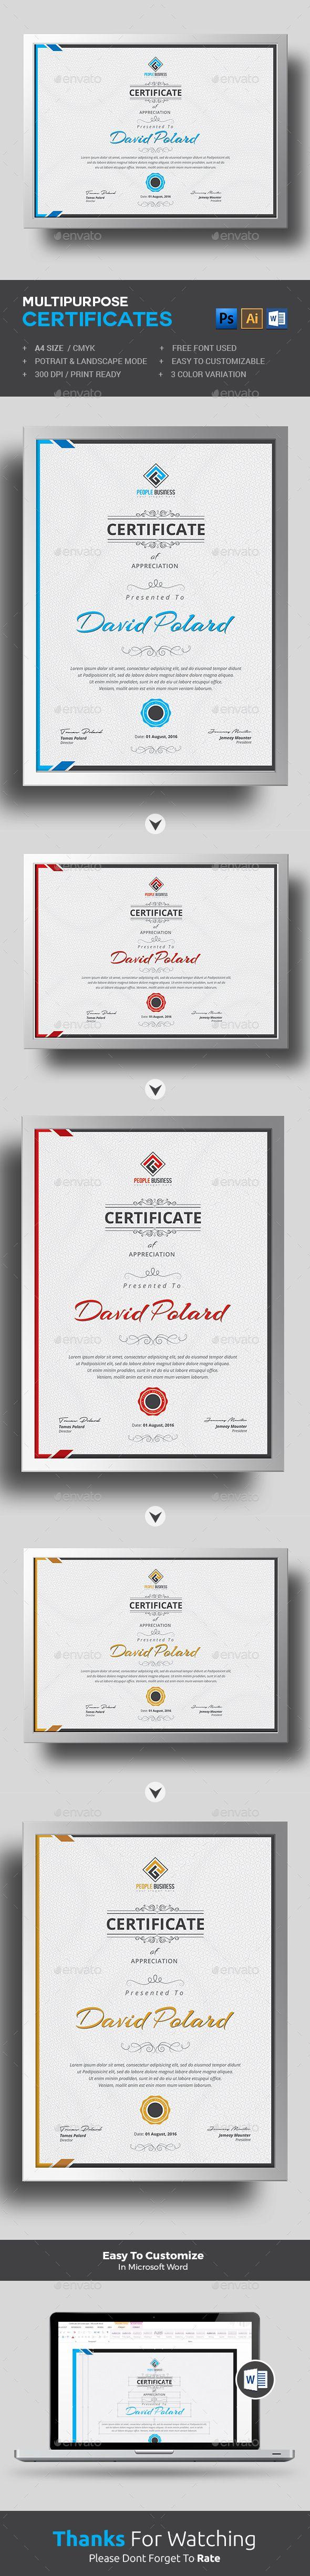 Certificate Ai Illustrator Certificate And Template